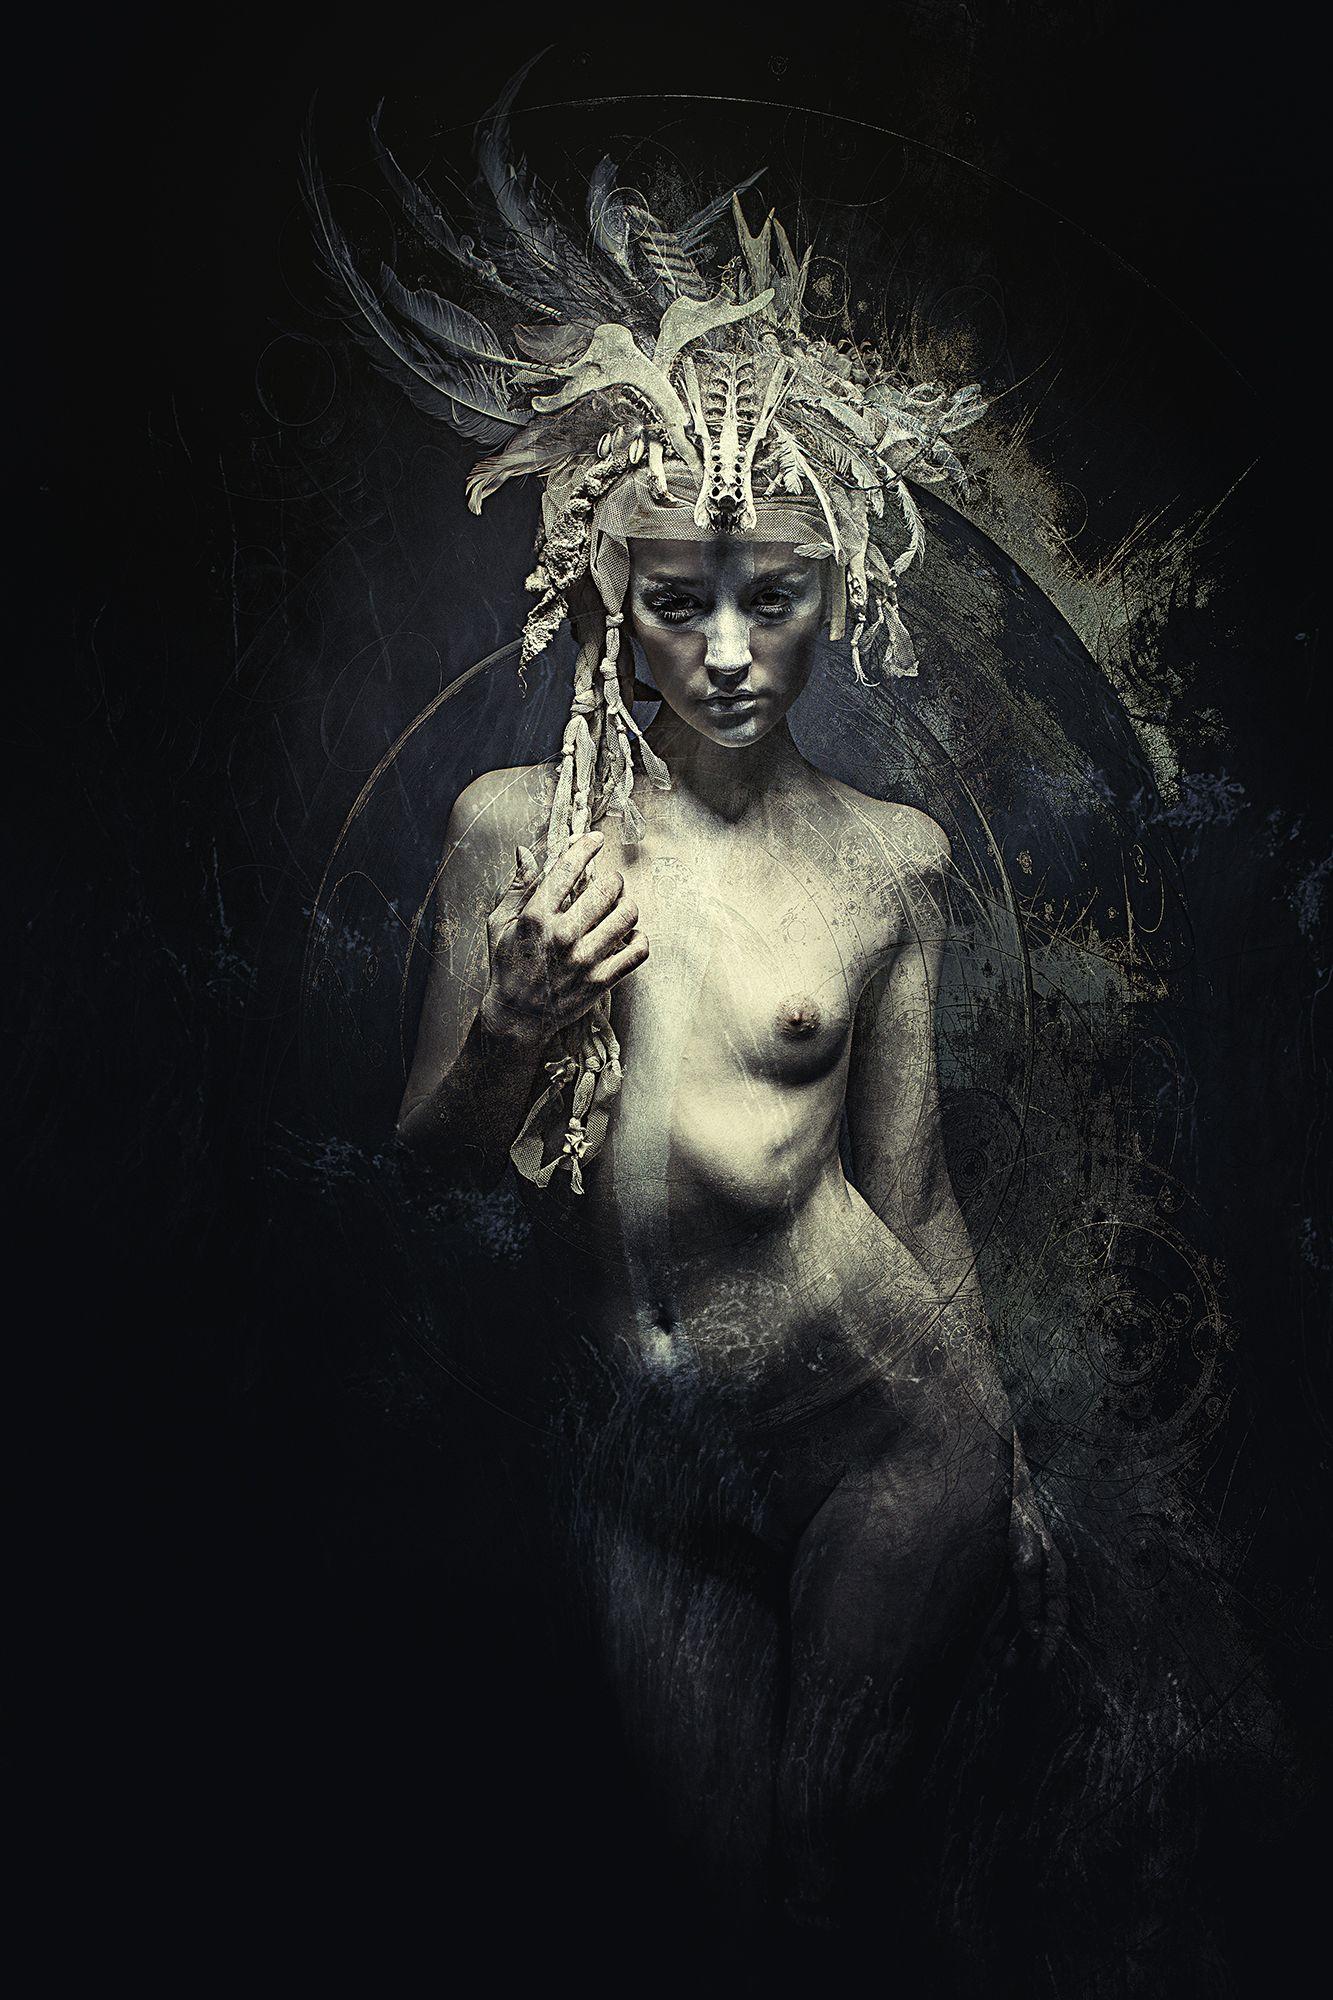 Very dark gothic nude art are